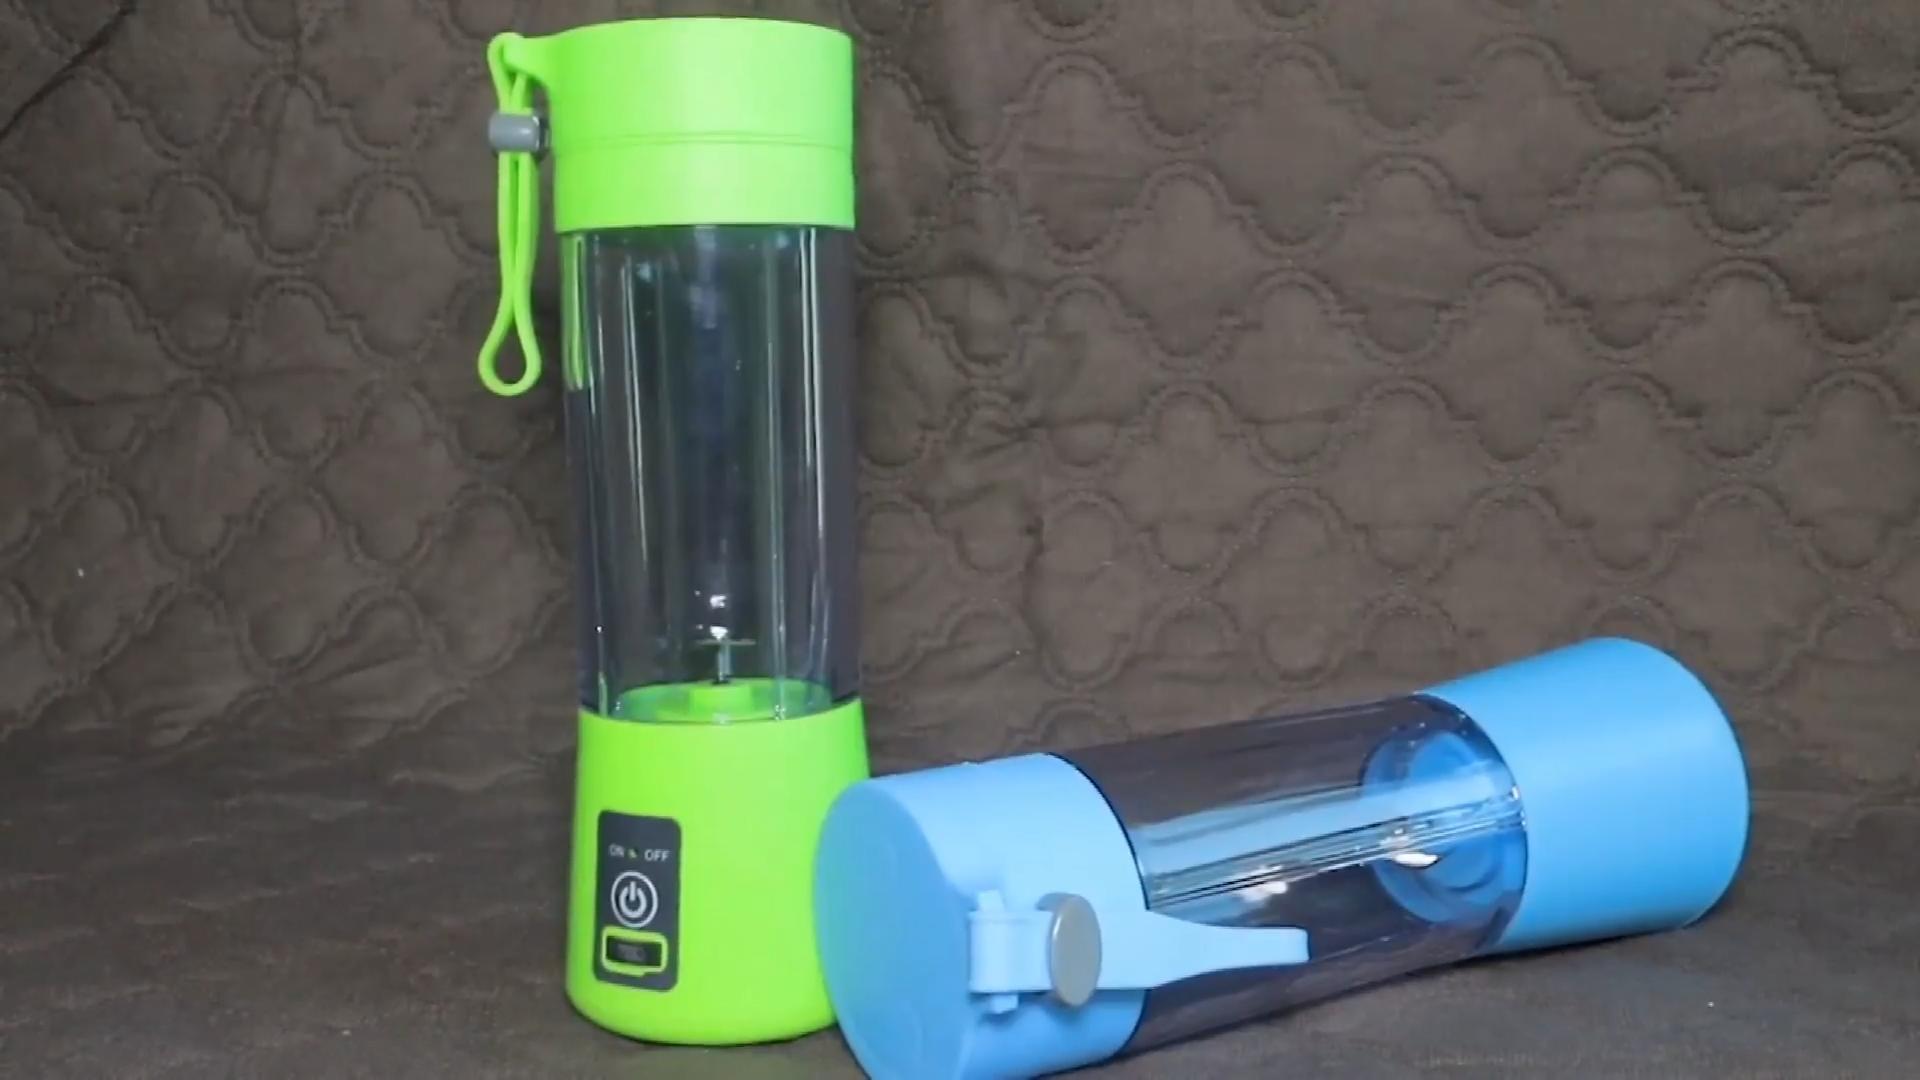 Portable Blender Mini Personal Blender Small Smoothie Blender USB Fruit Juicer Mixer BPA free